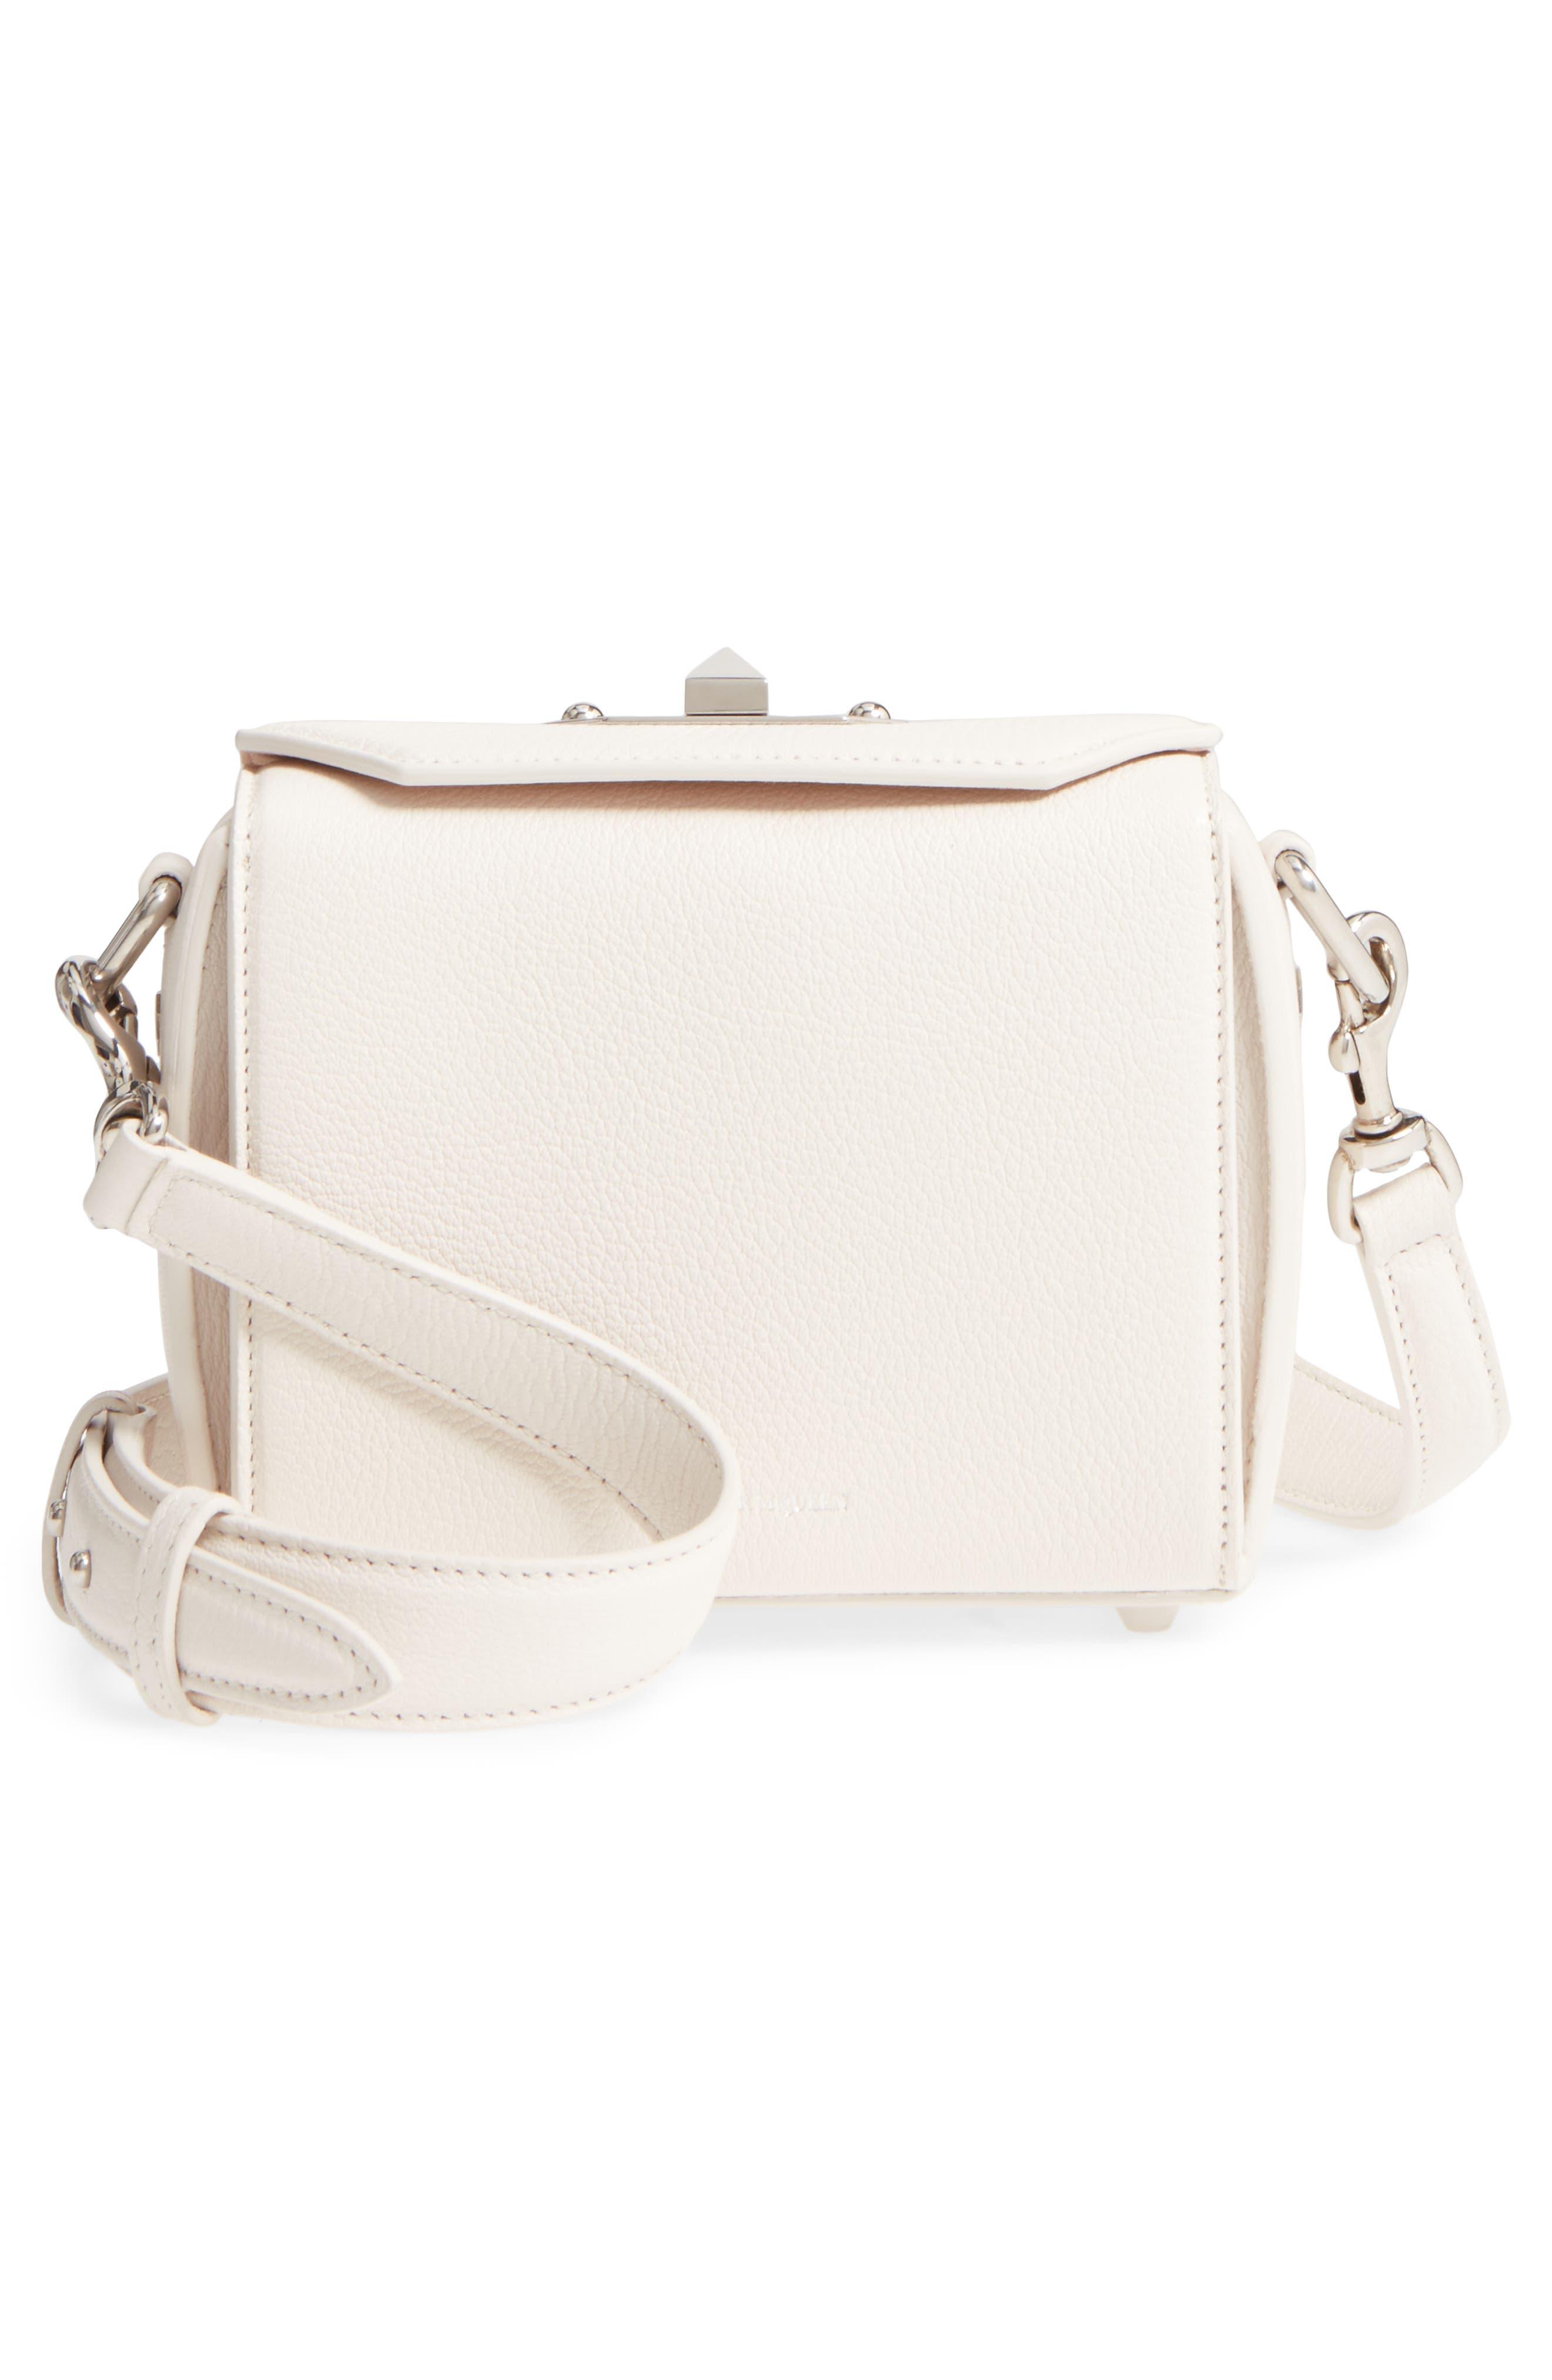 Box Bag 16 Grained Leather Bag,                             Alternate thumbnail 3, color,                             900